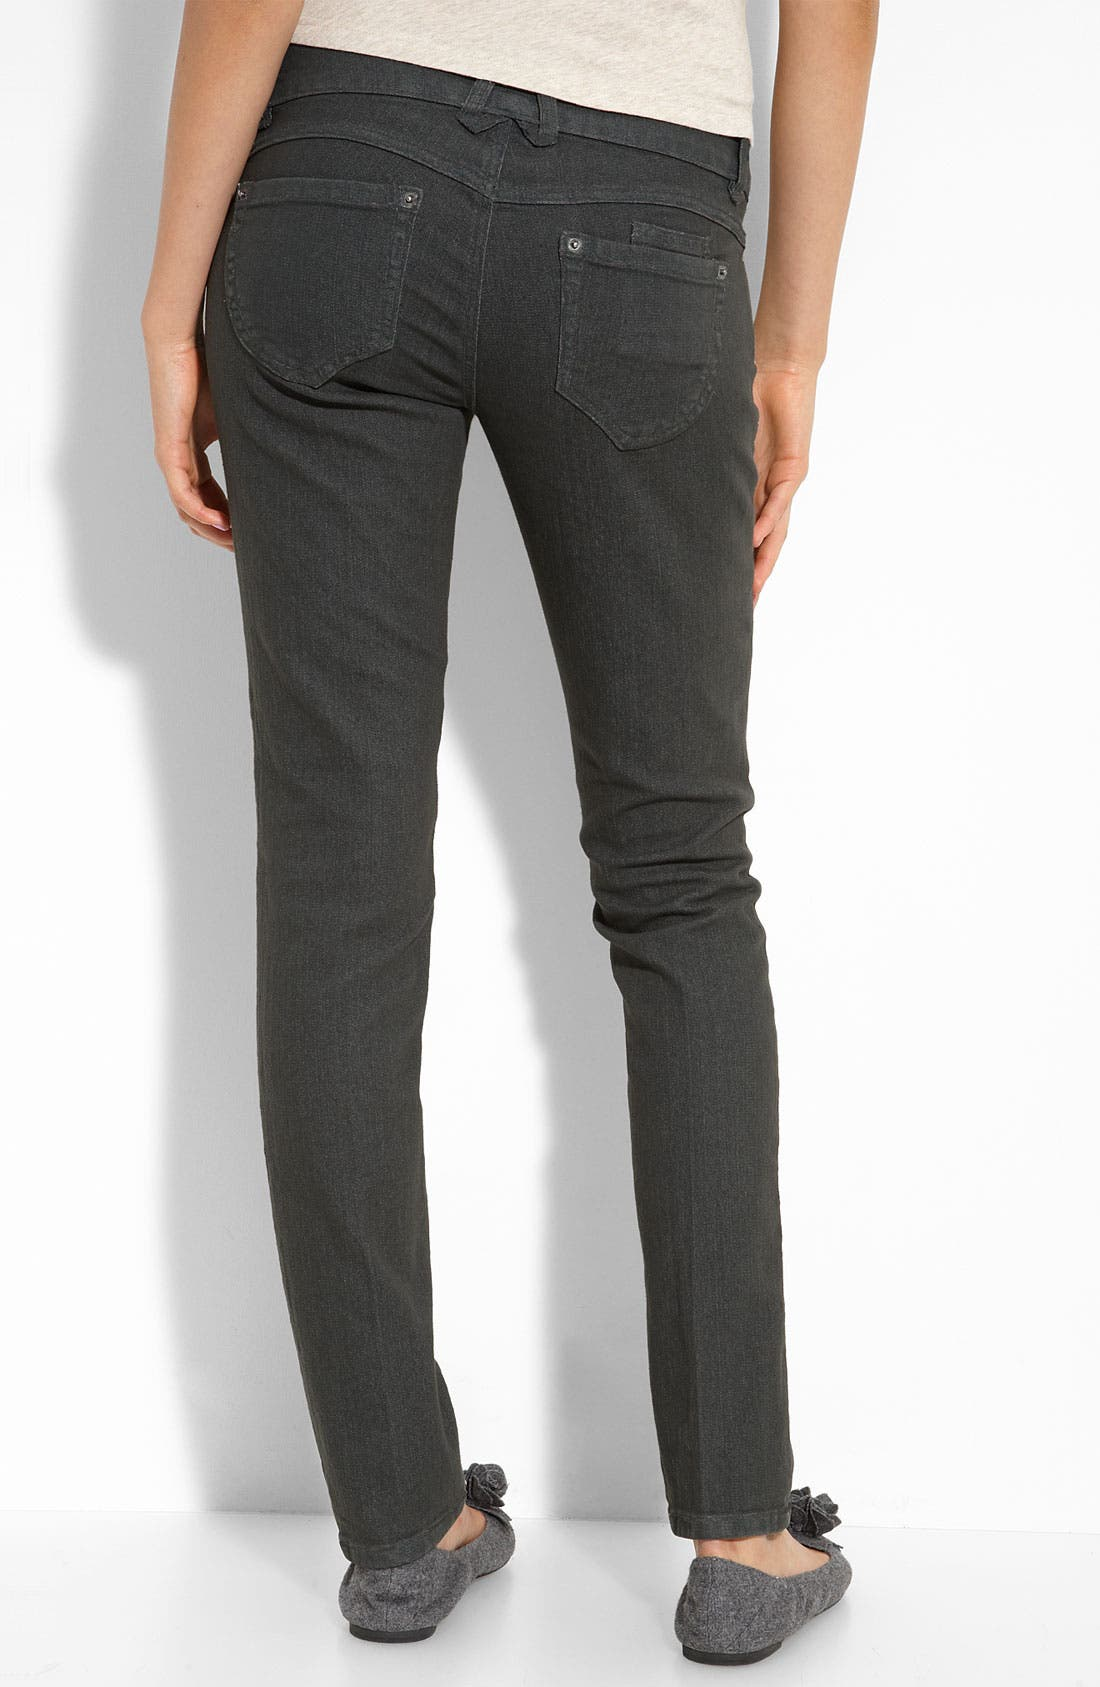 Main Image - Jolt Skinny Jeans (Indigo Wash) (Juniors)